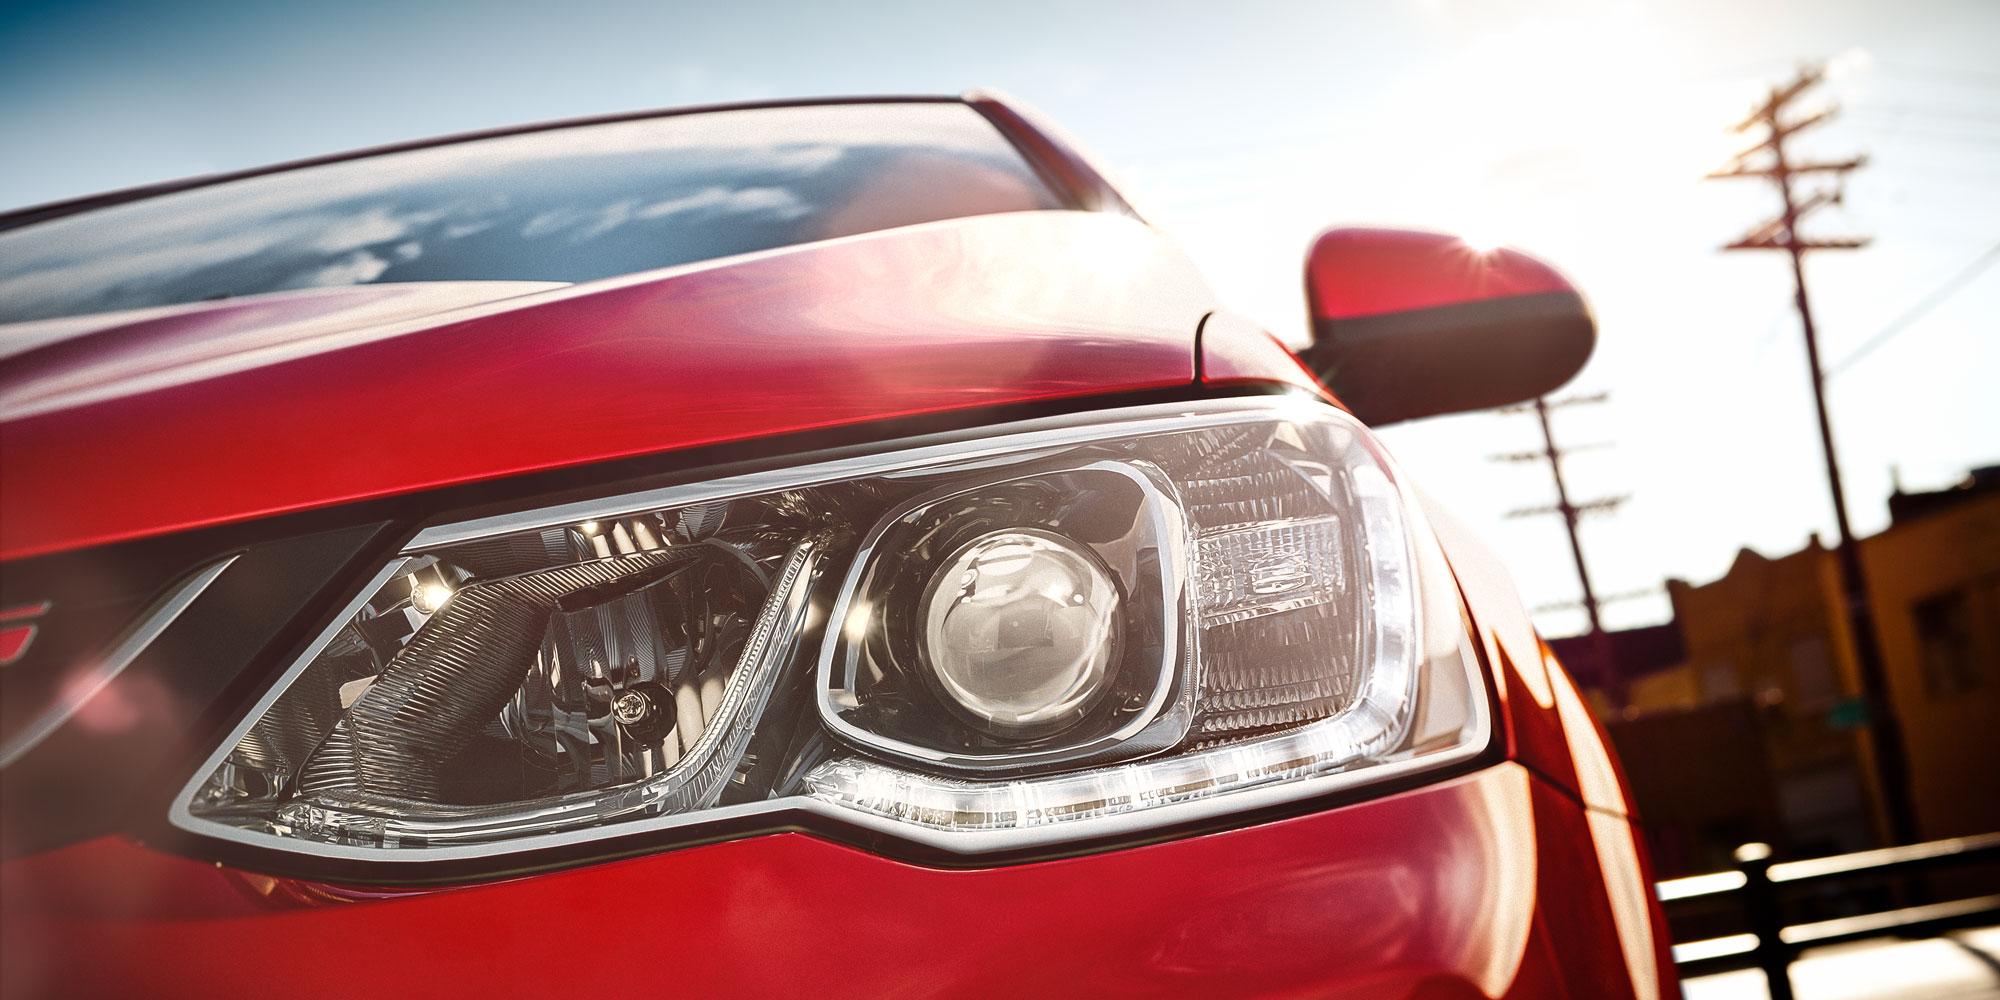 Diseño del auto compacto Chevrolet Sonic 2018: faro delantero